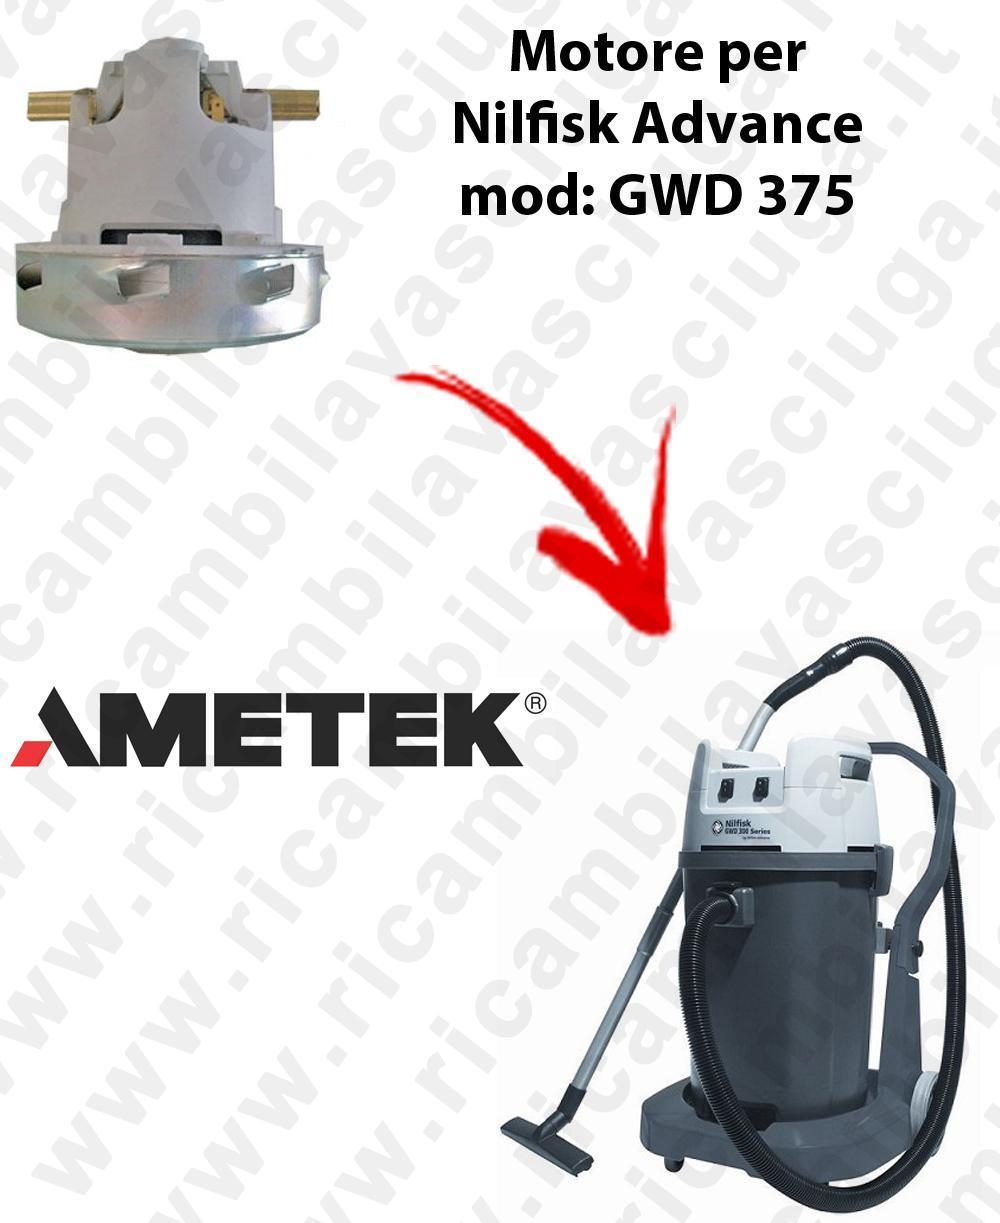 GWD 375  MOTEUR ASPIRATION AMETEK pour aspirateur Nilfisk Advance